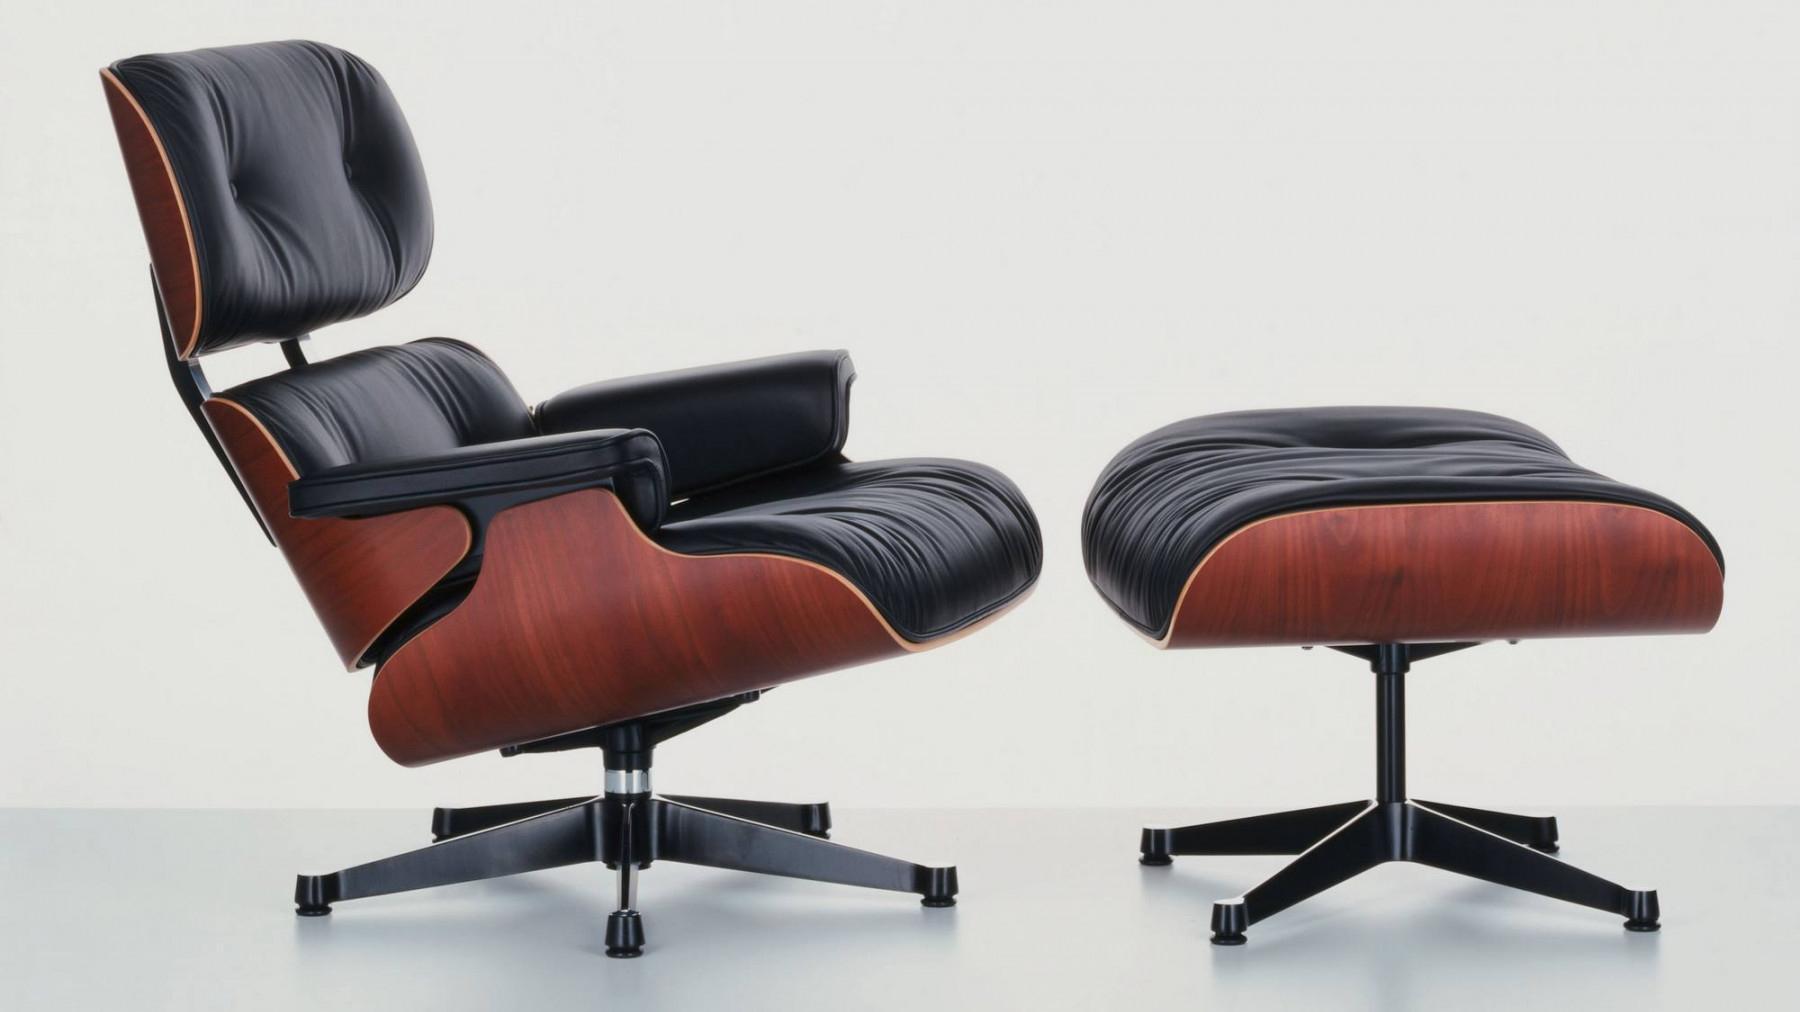 Mid-century modern design: Eames Lounge Chair